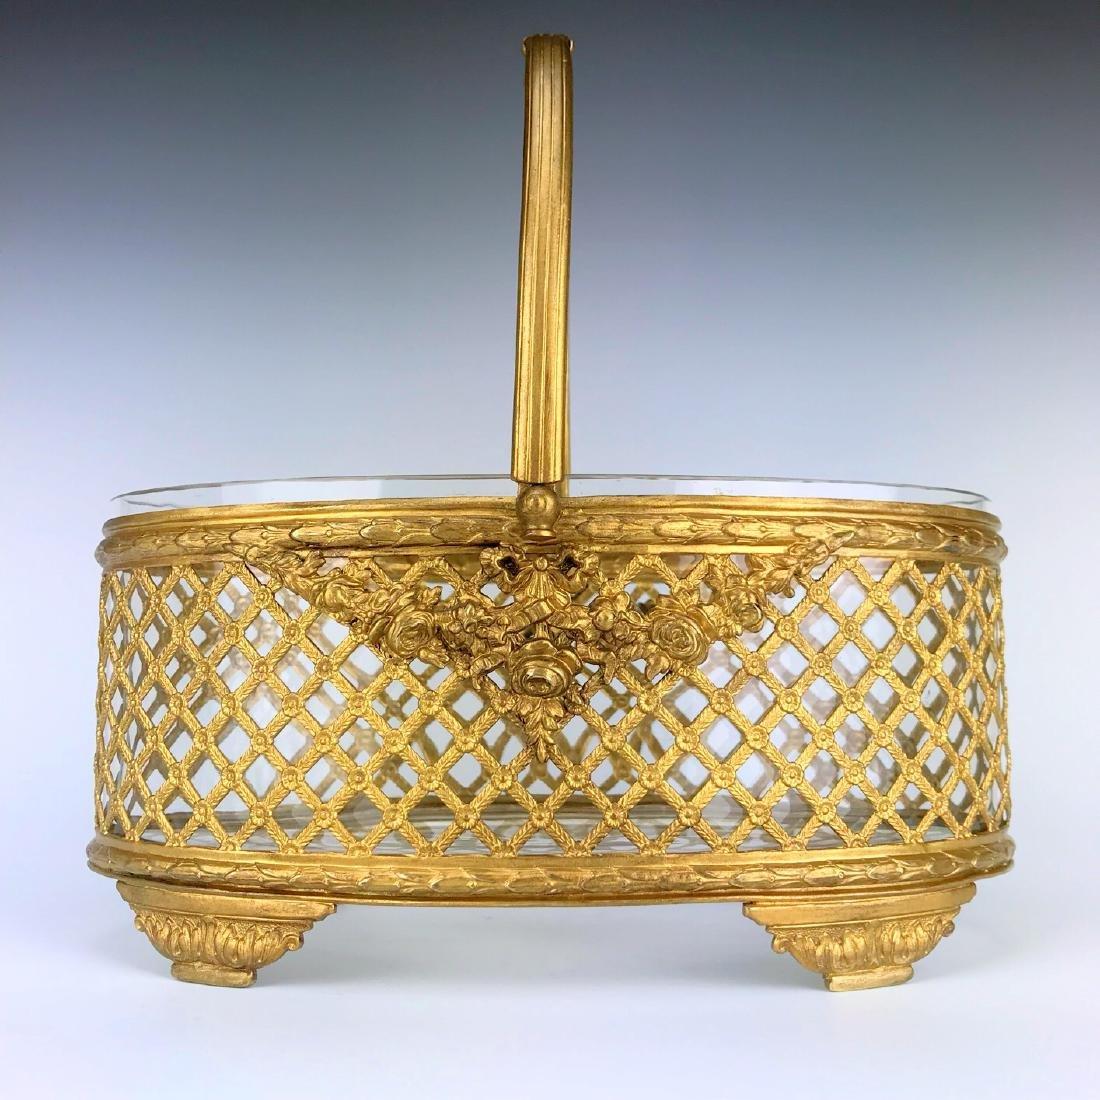 19th C. Bronze & Baccarat Crystal Basket/Centerpiece - 2